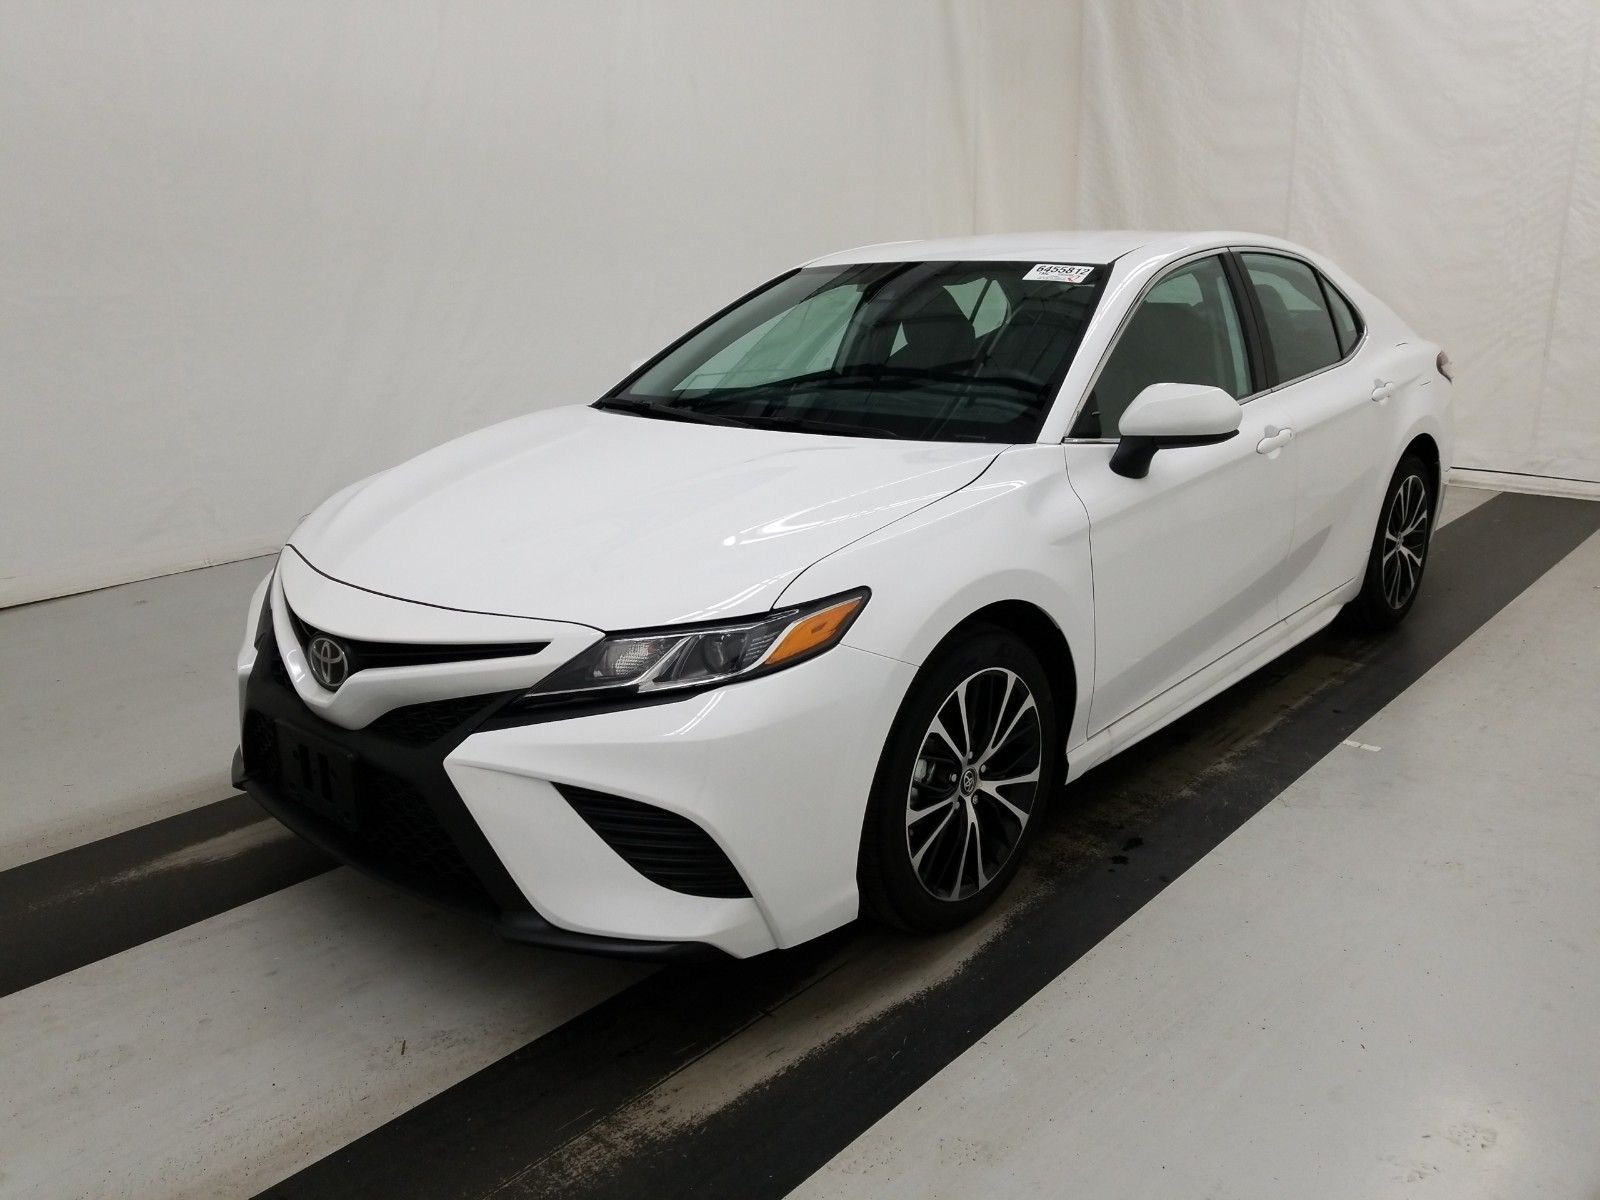 2019 Toyota Camry 2.5. Lot 99921011784 Vin 4T1B11HK6KU833231